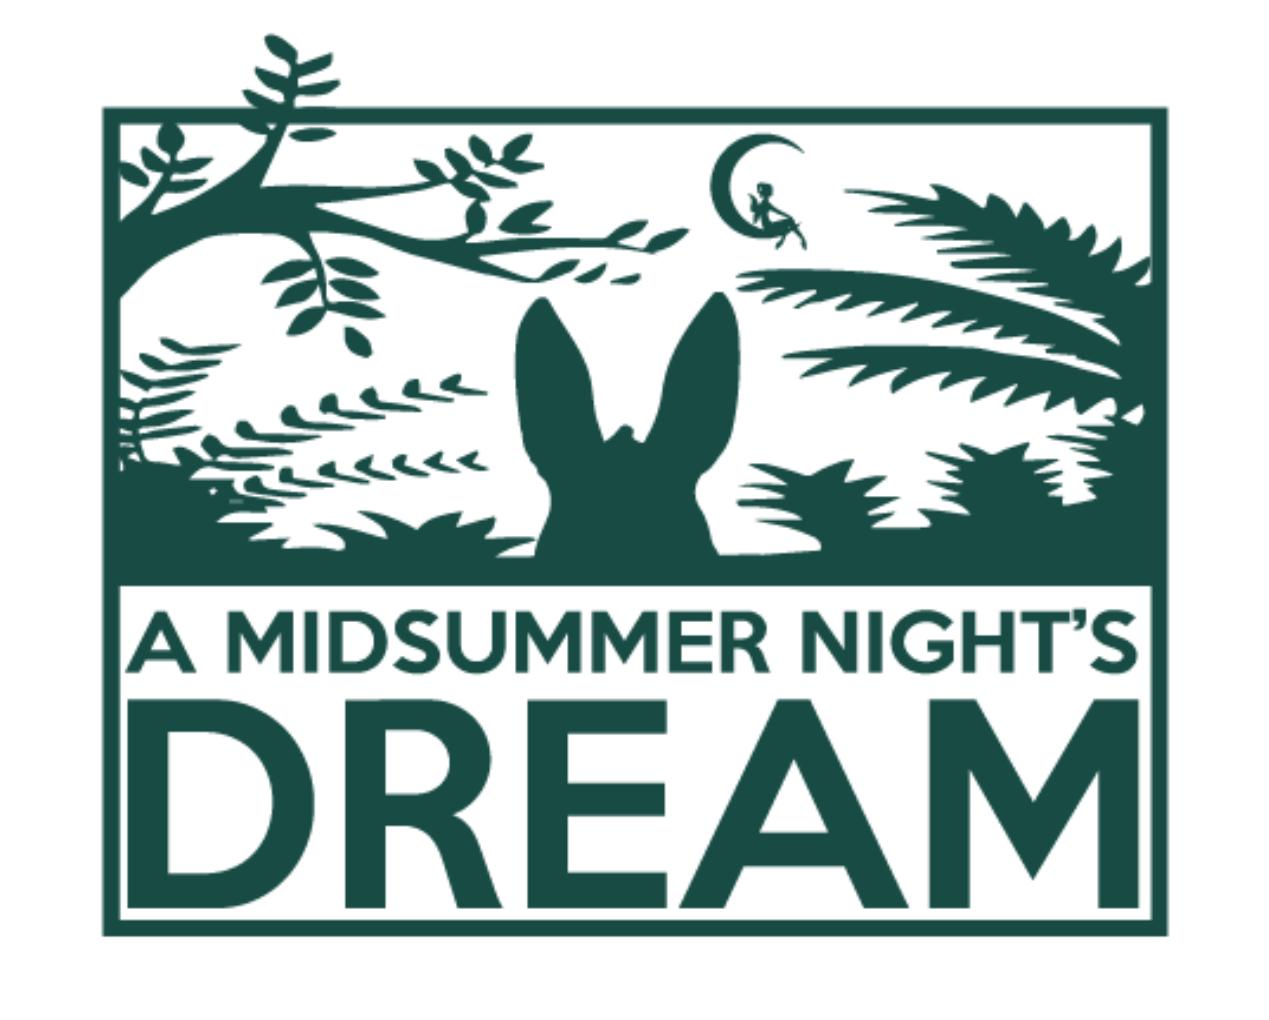 A Midsummer Night's Dream at Round Rock High School